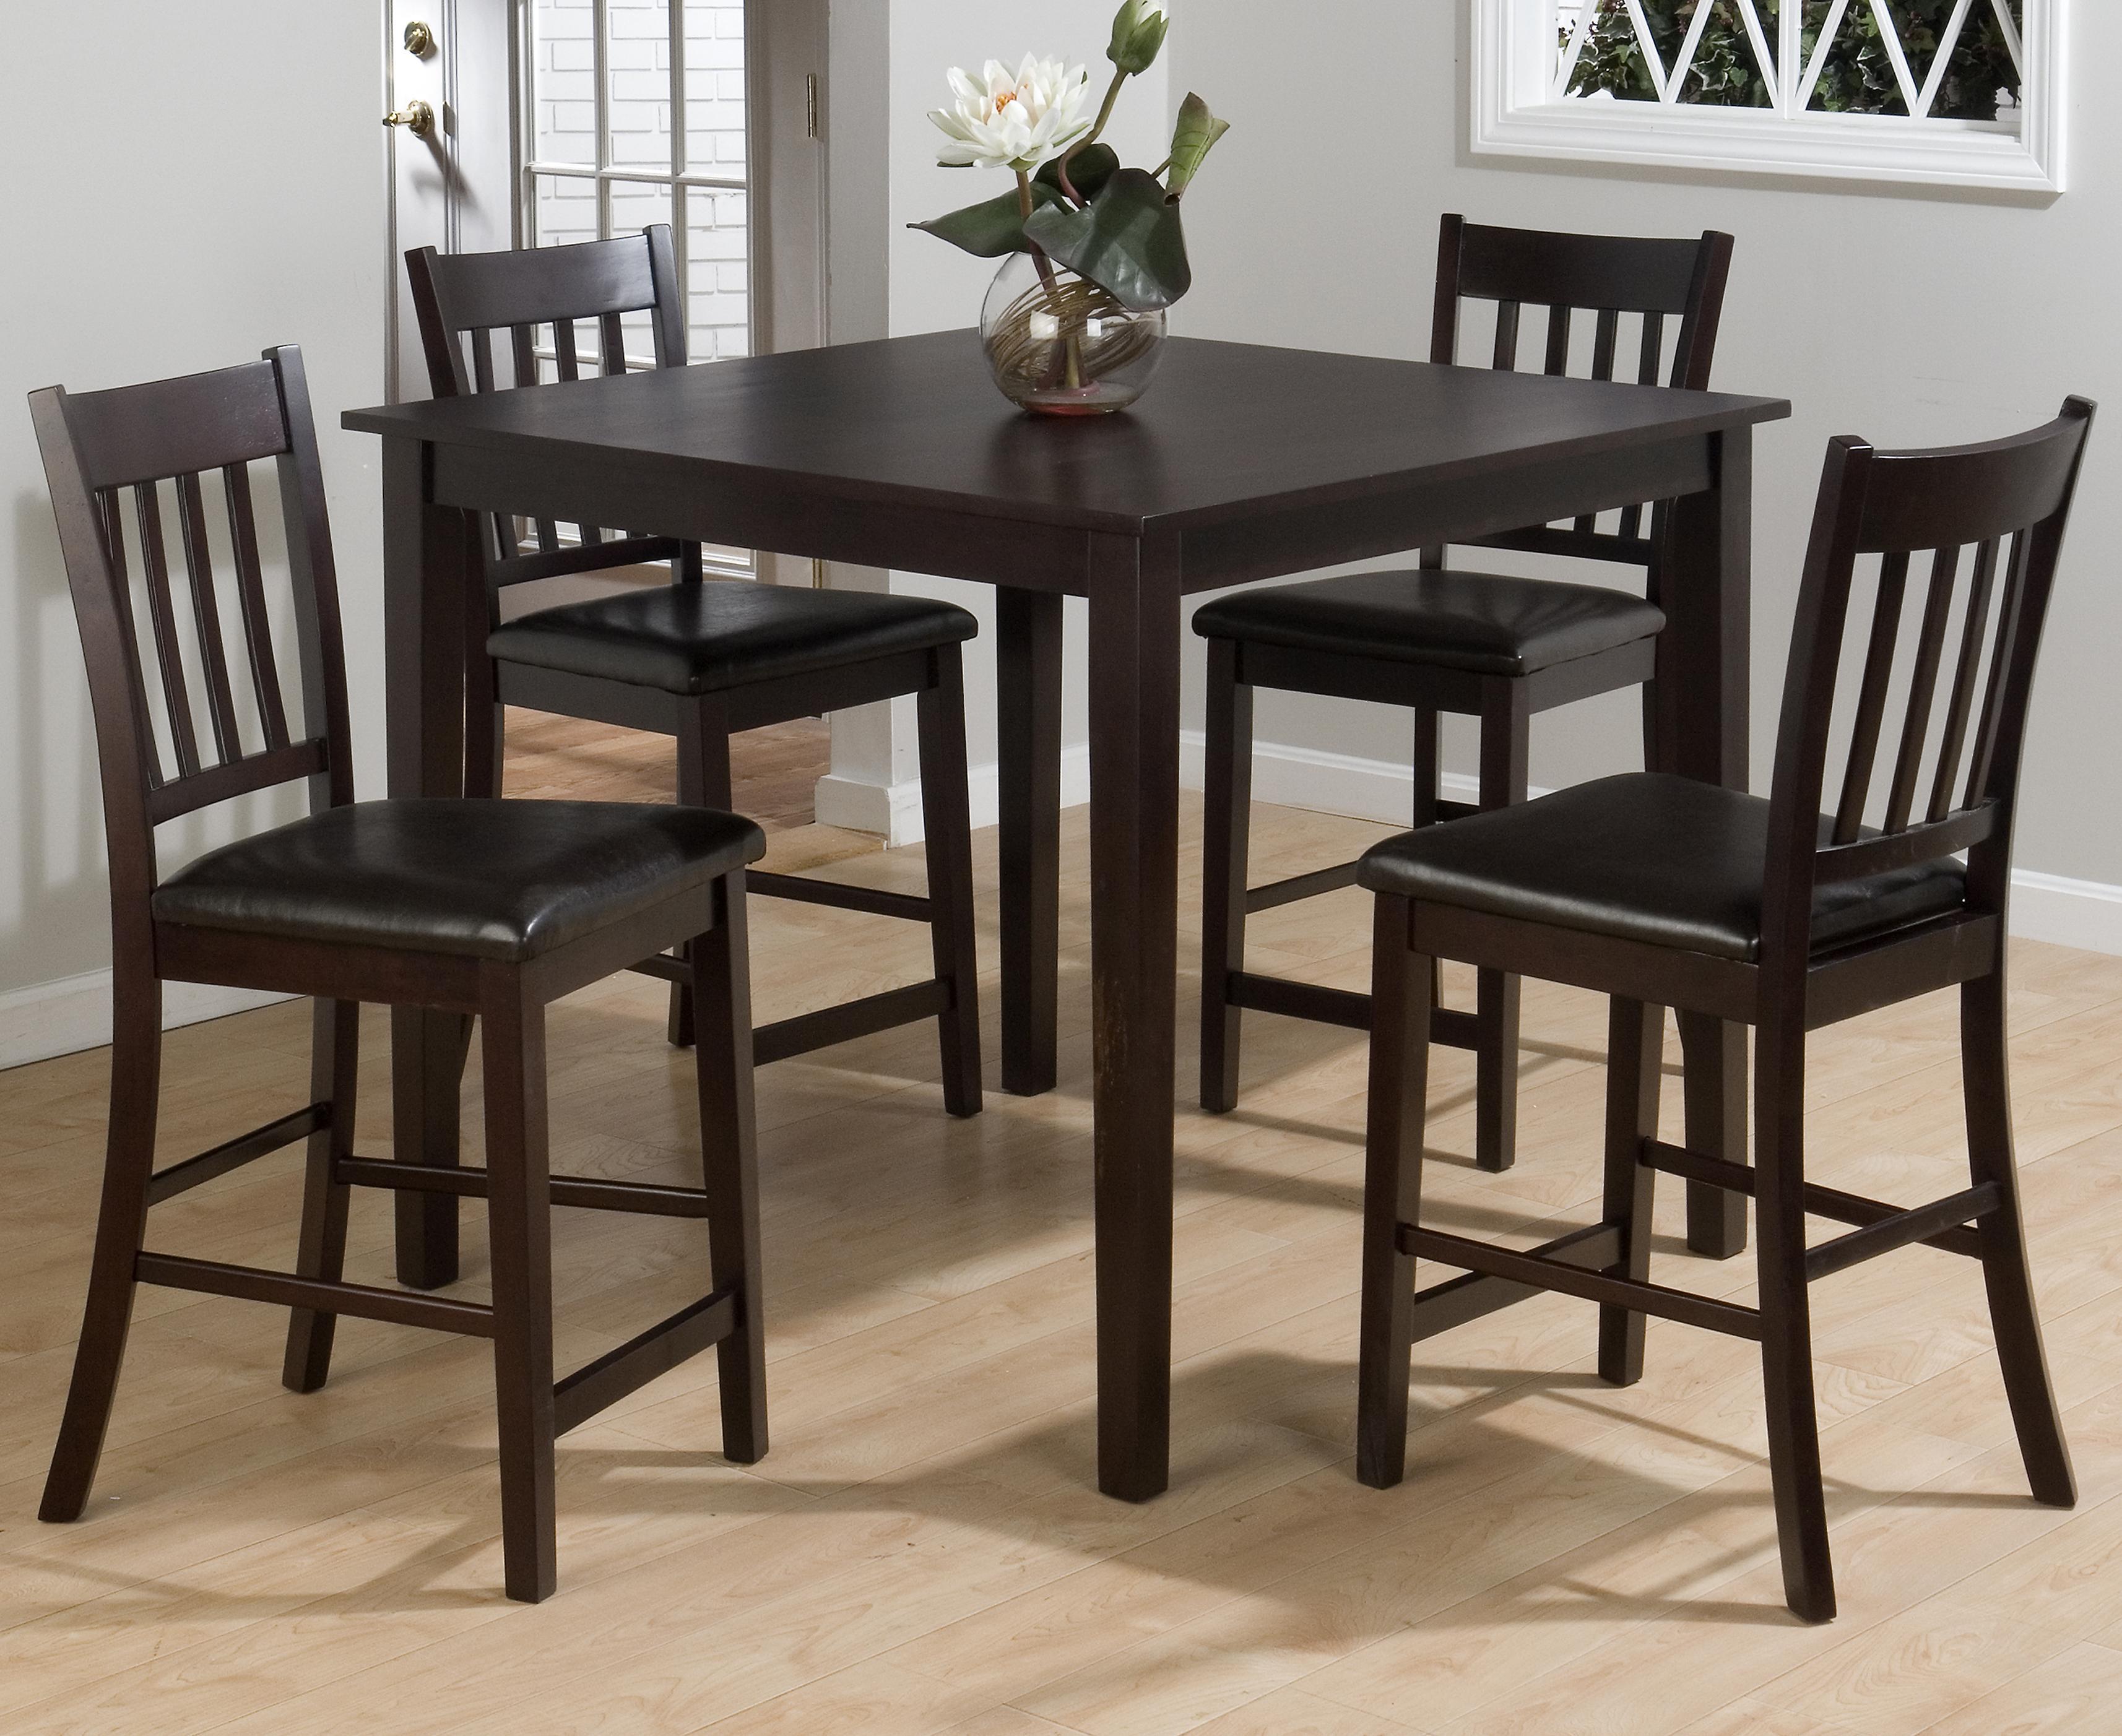 Marin County Merlot 5-Piece Pub Table Set by Jofran at A1 Furniture & Mattress